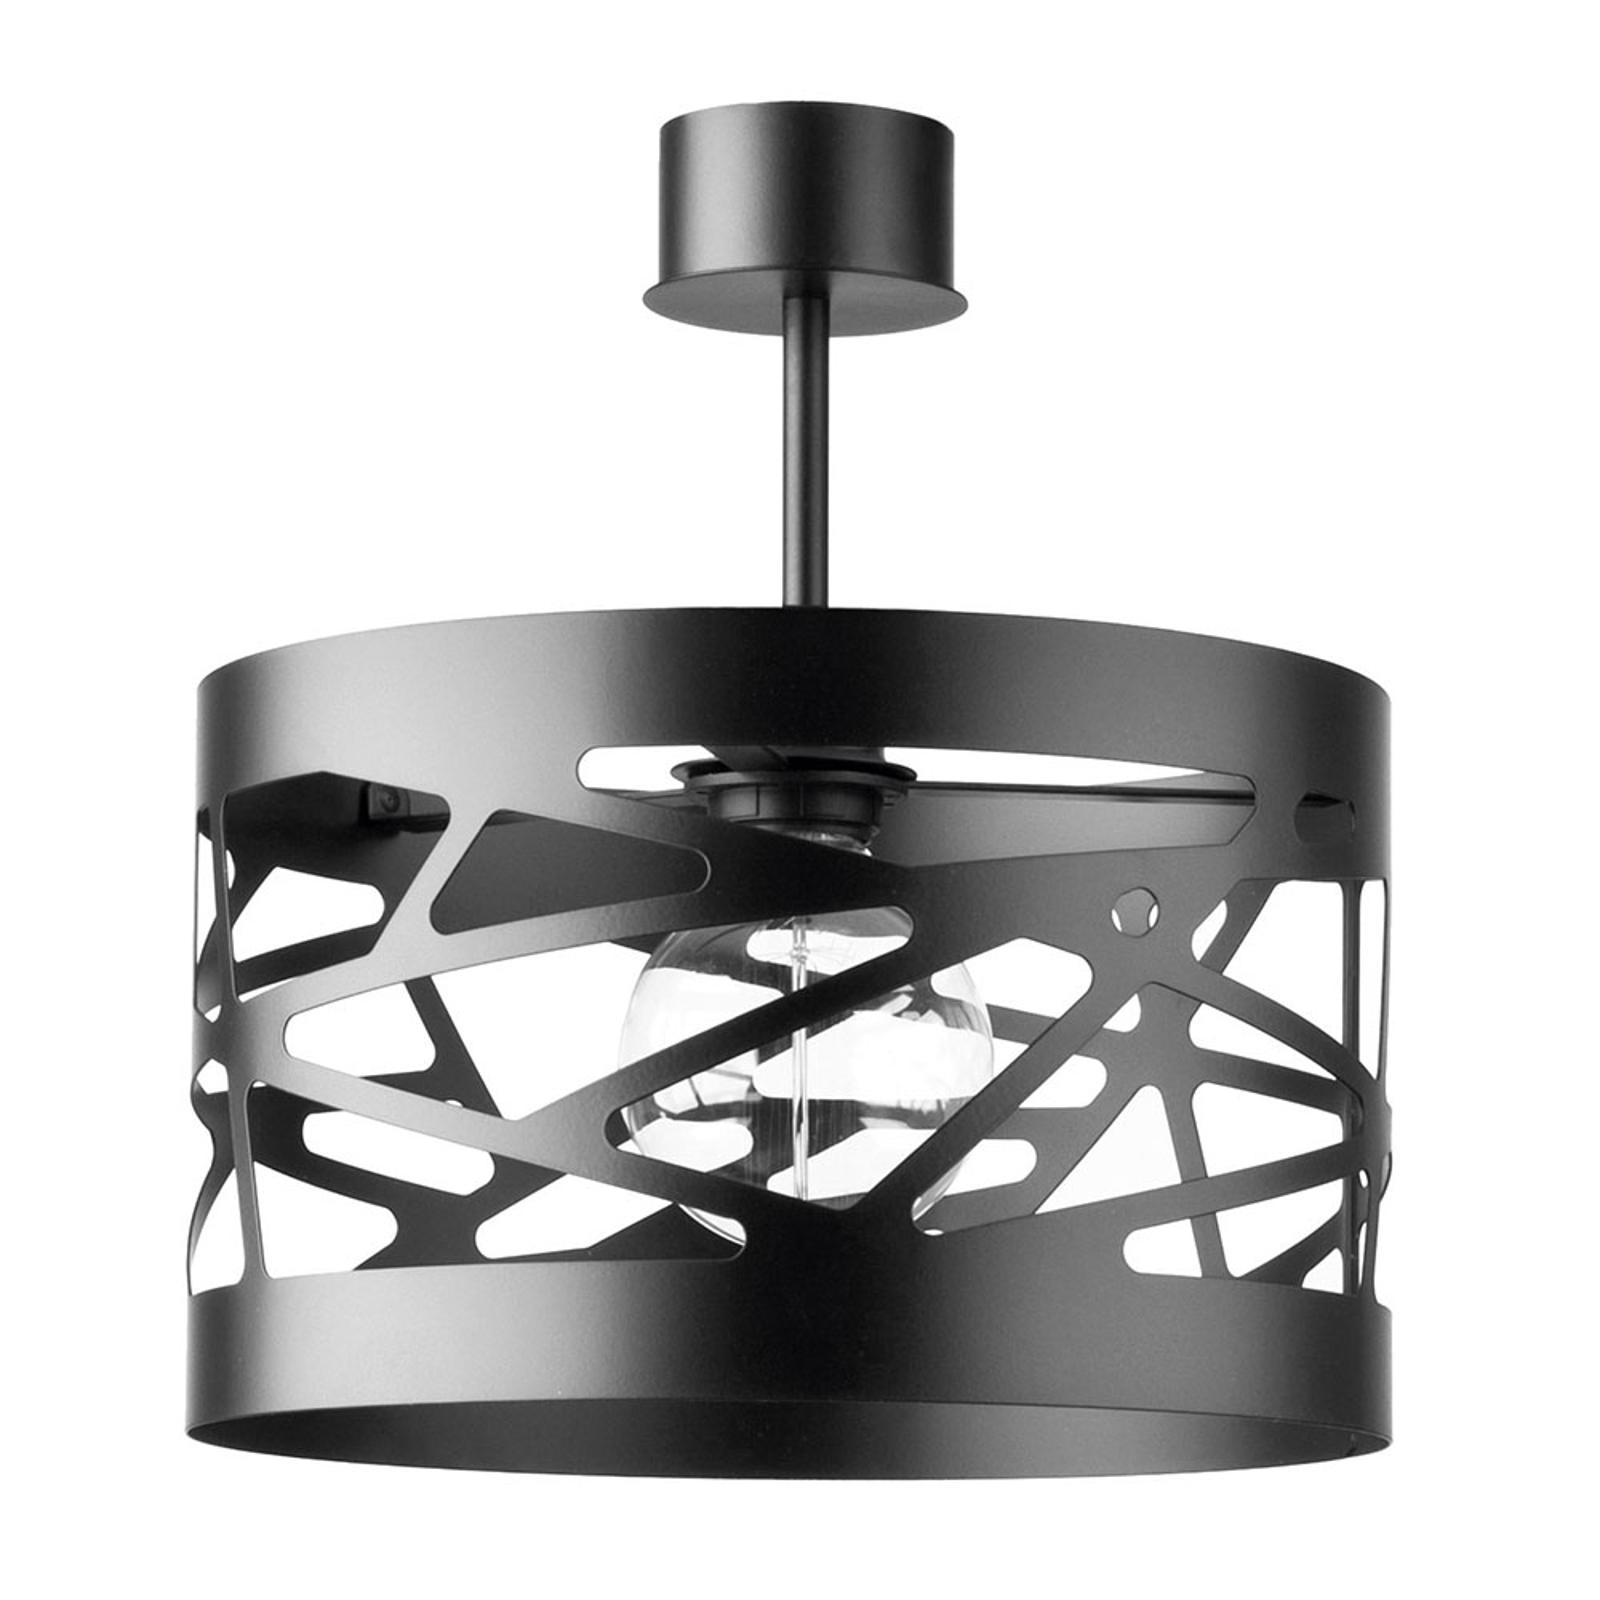 Modul Frez taklampe, Ø 30 cm, svart